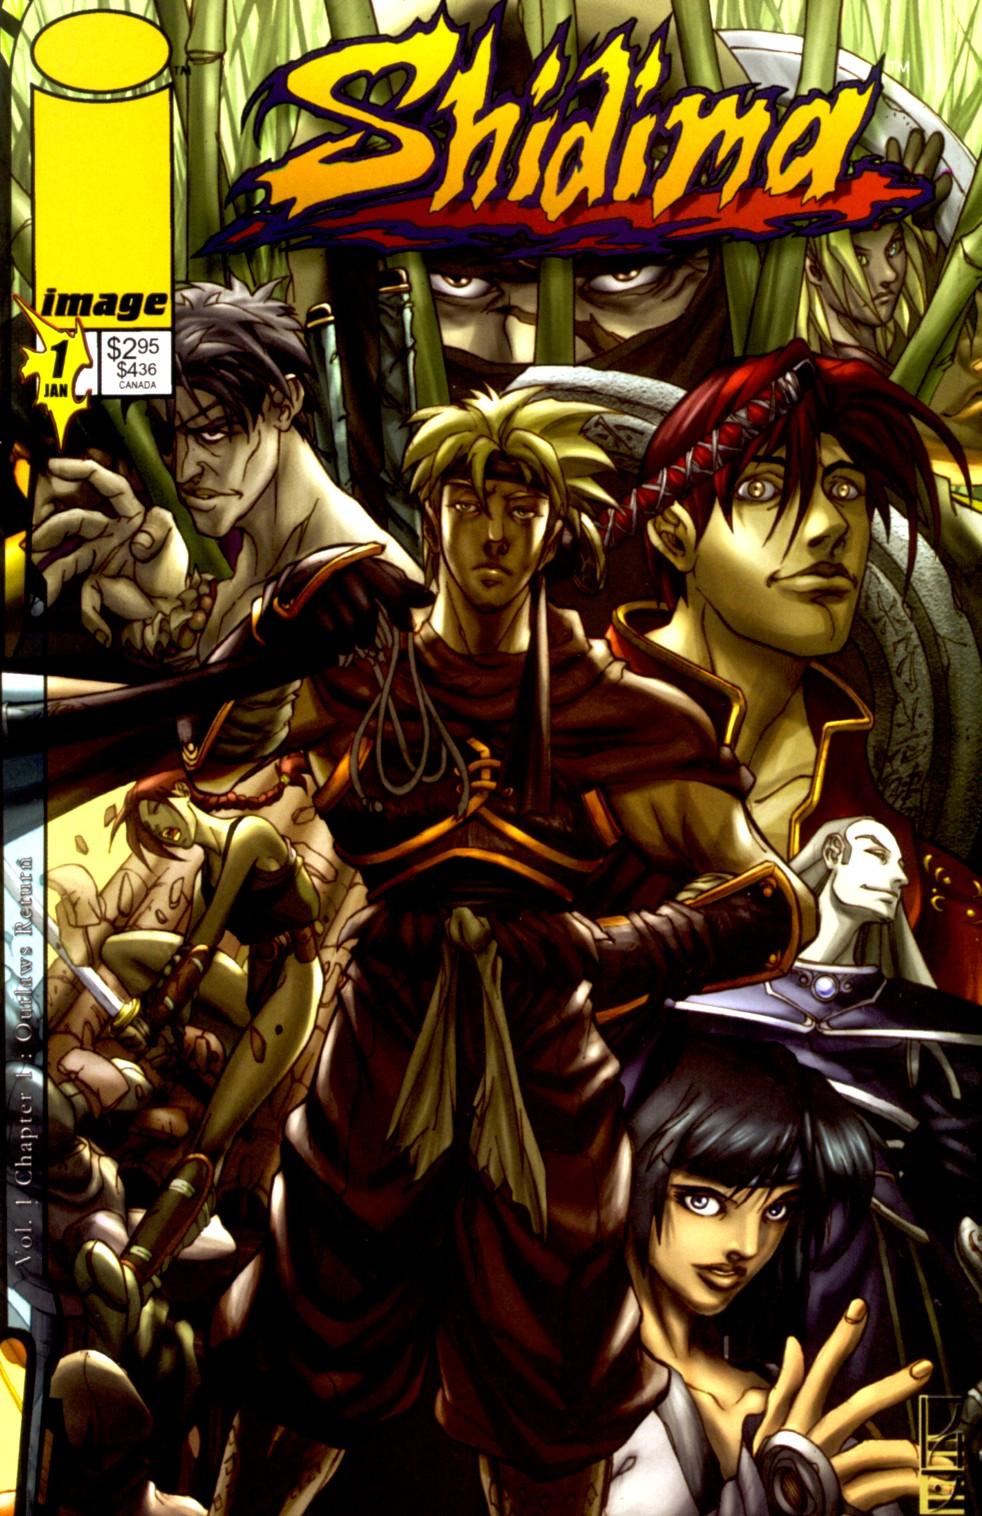 Read online Shidima comic -  Issue #1 - 1